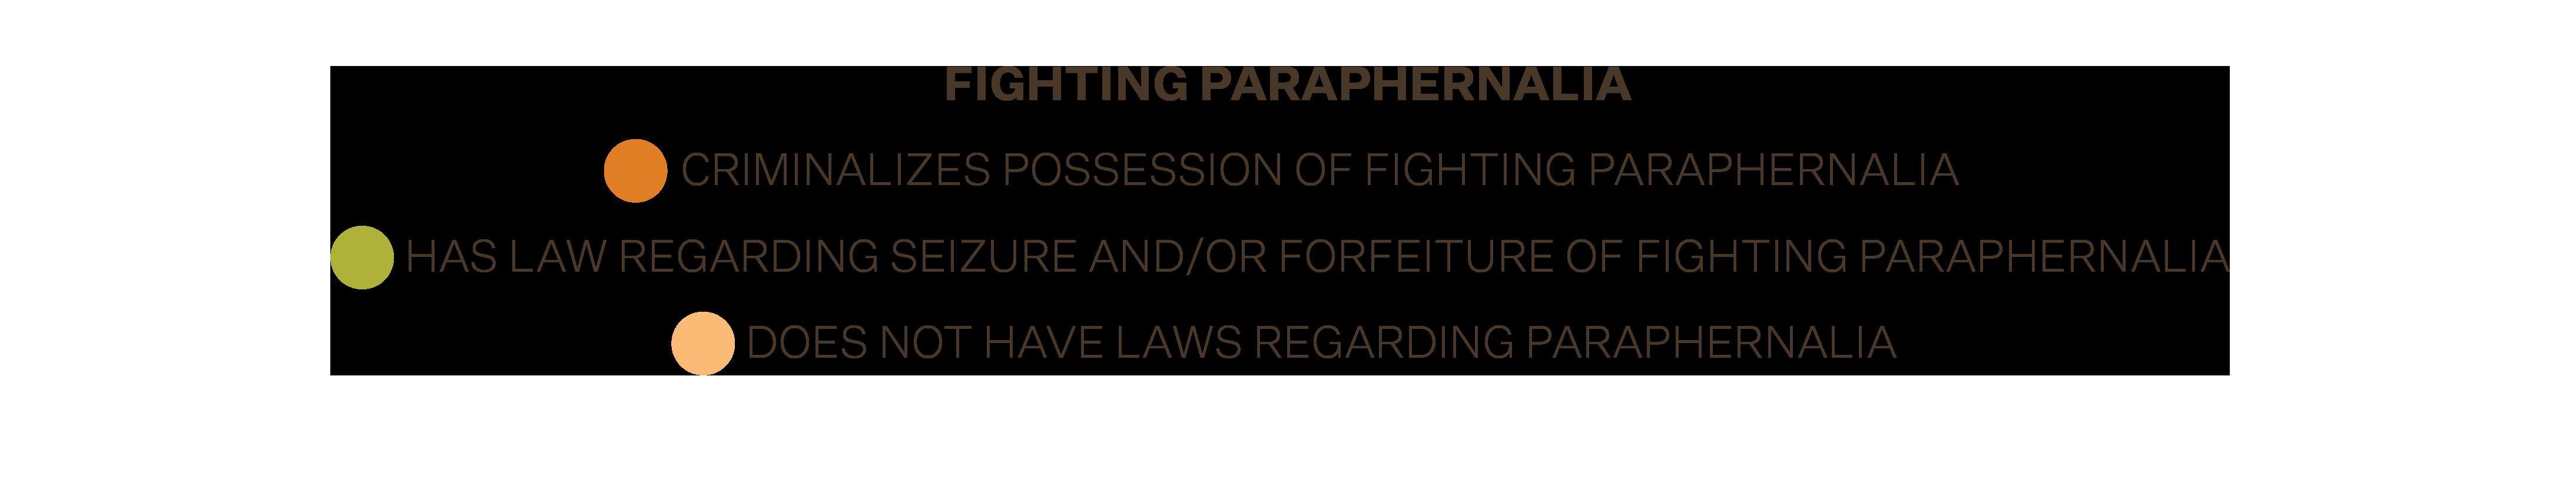 2019 Trend Report: Laws against animal fighting paraphernalia